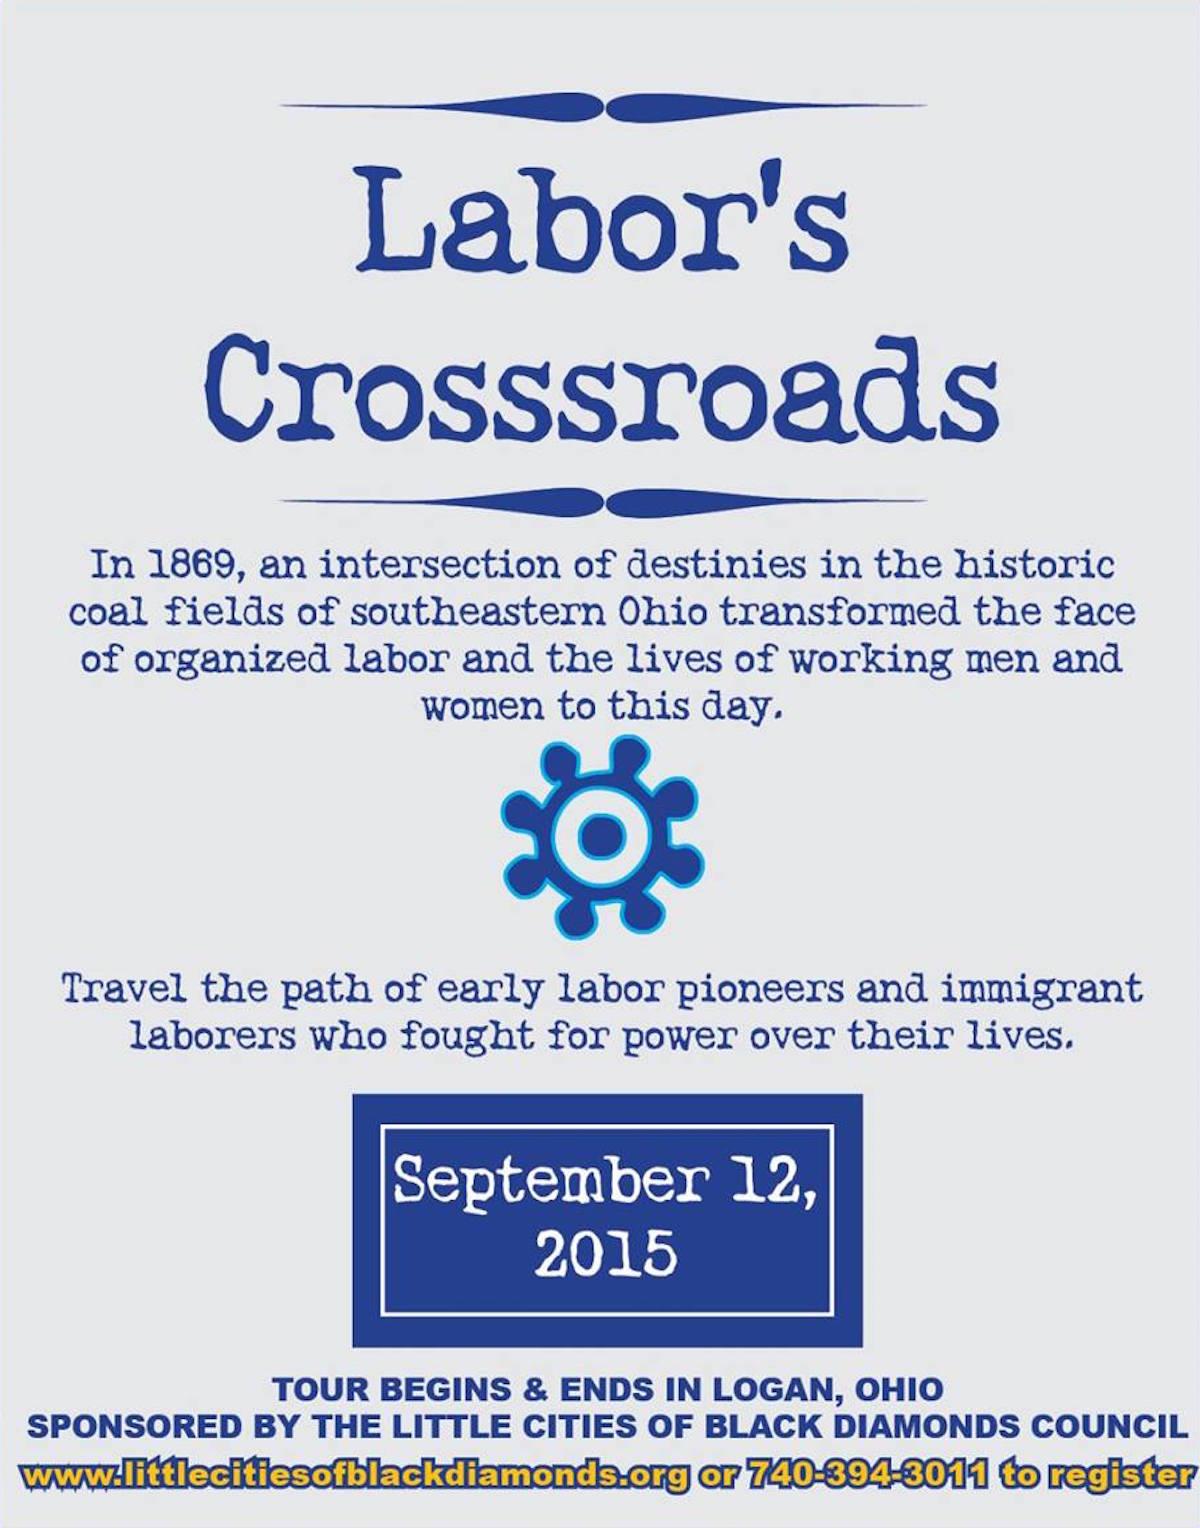 Labor's Crossroads tour poster